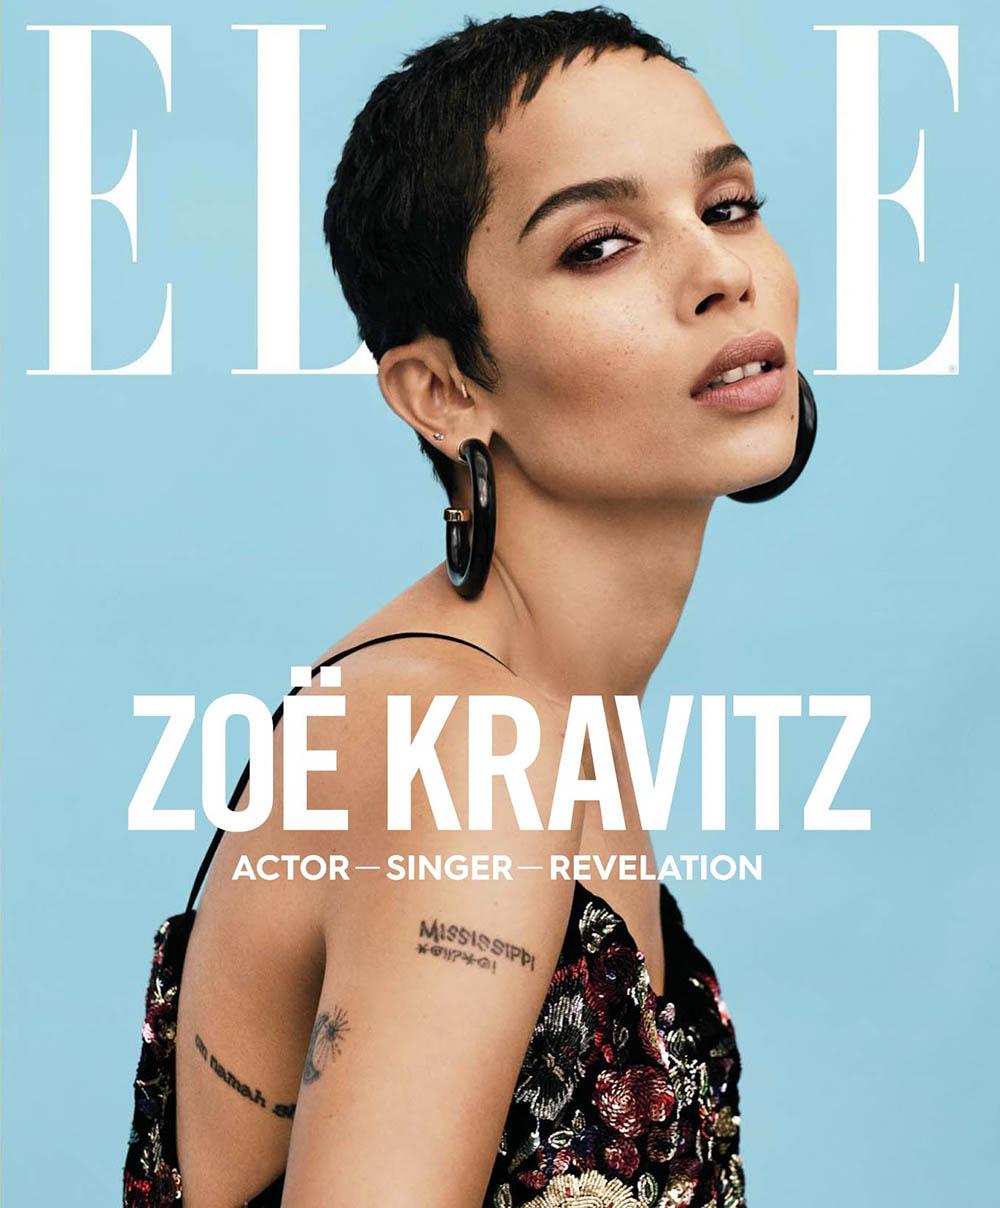 Zoe Kravitz covers Elle US January 2018 by Paola Kudacki